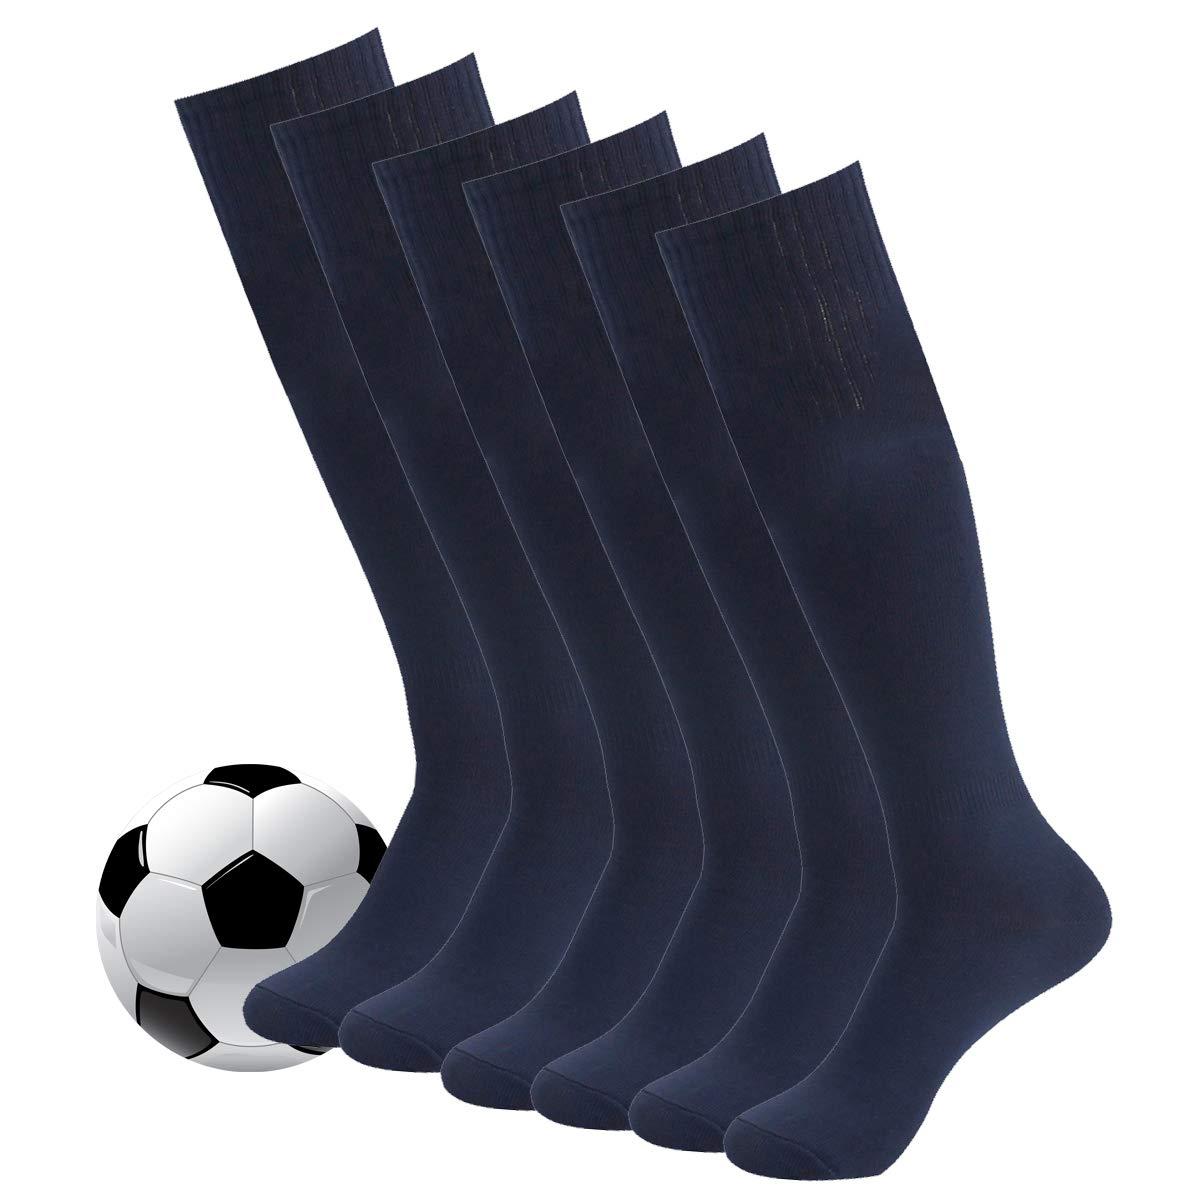 Football Socks,Mens Womens Team Sports Long Tube Softball Socks 6 Pairs Navy by Fasoar